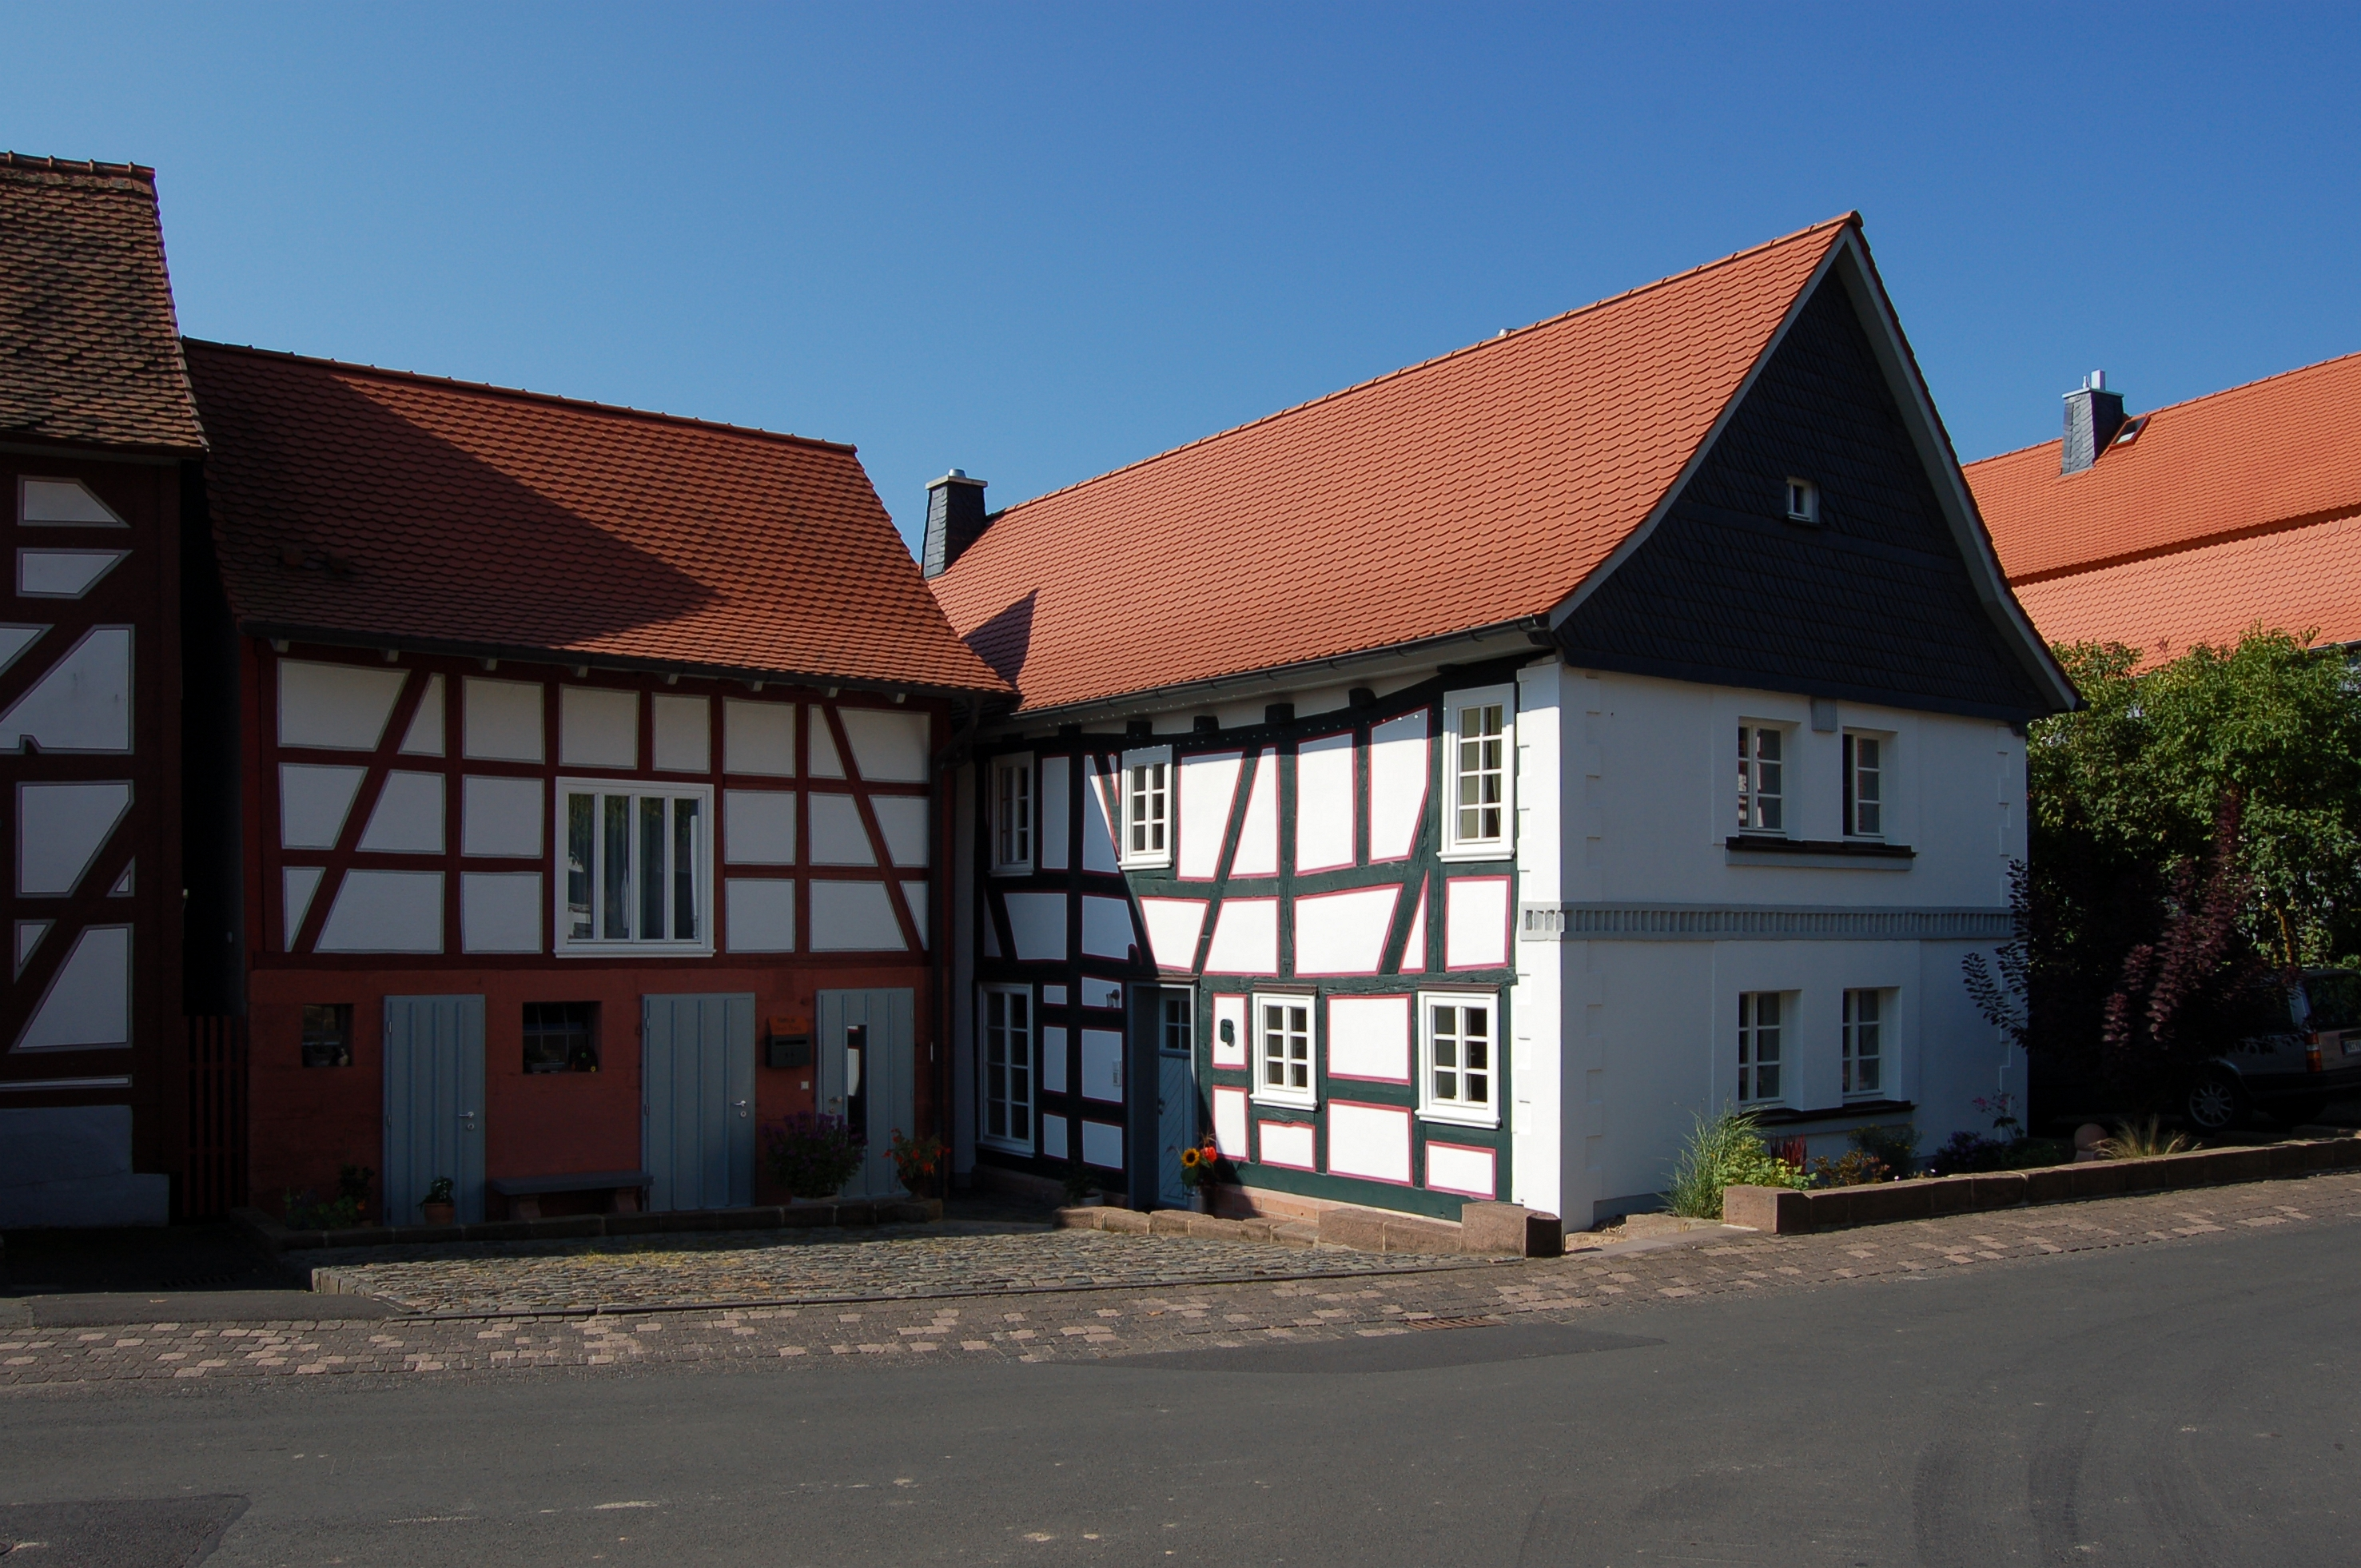 File:An der Linde 06 (Himmelsberg) X.jpg - Wikimedia Commons